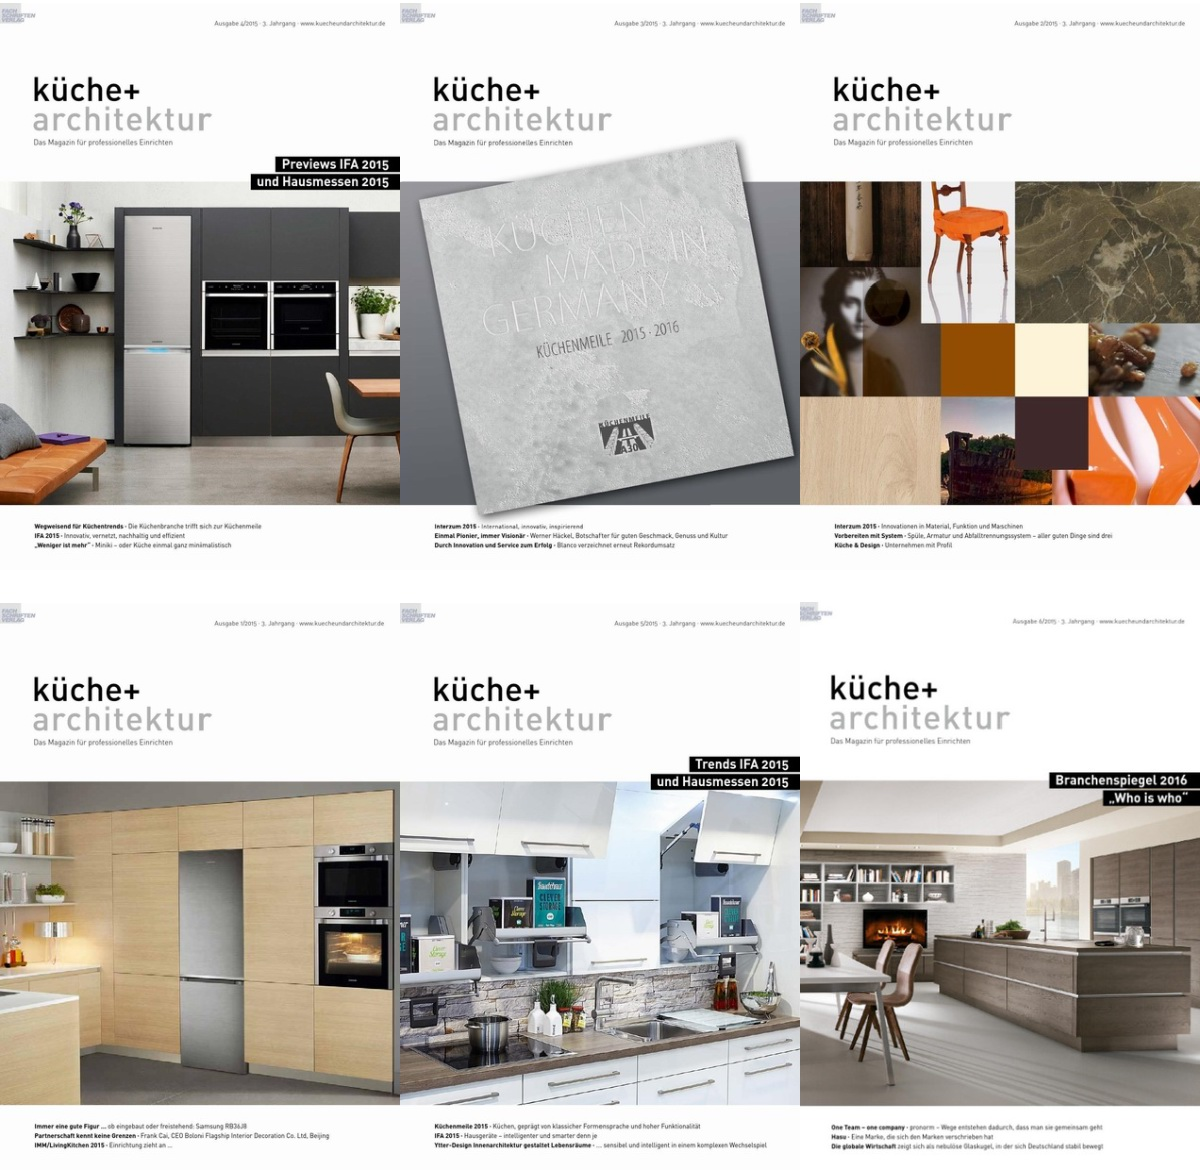 Küche & Architektur 德国厨房设计 2015年全集(6本)